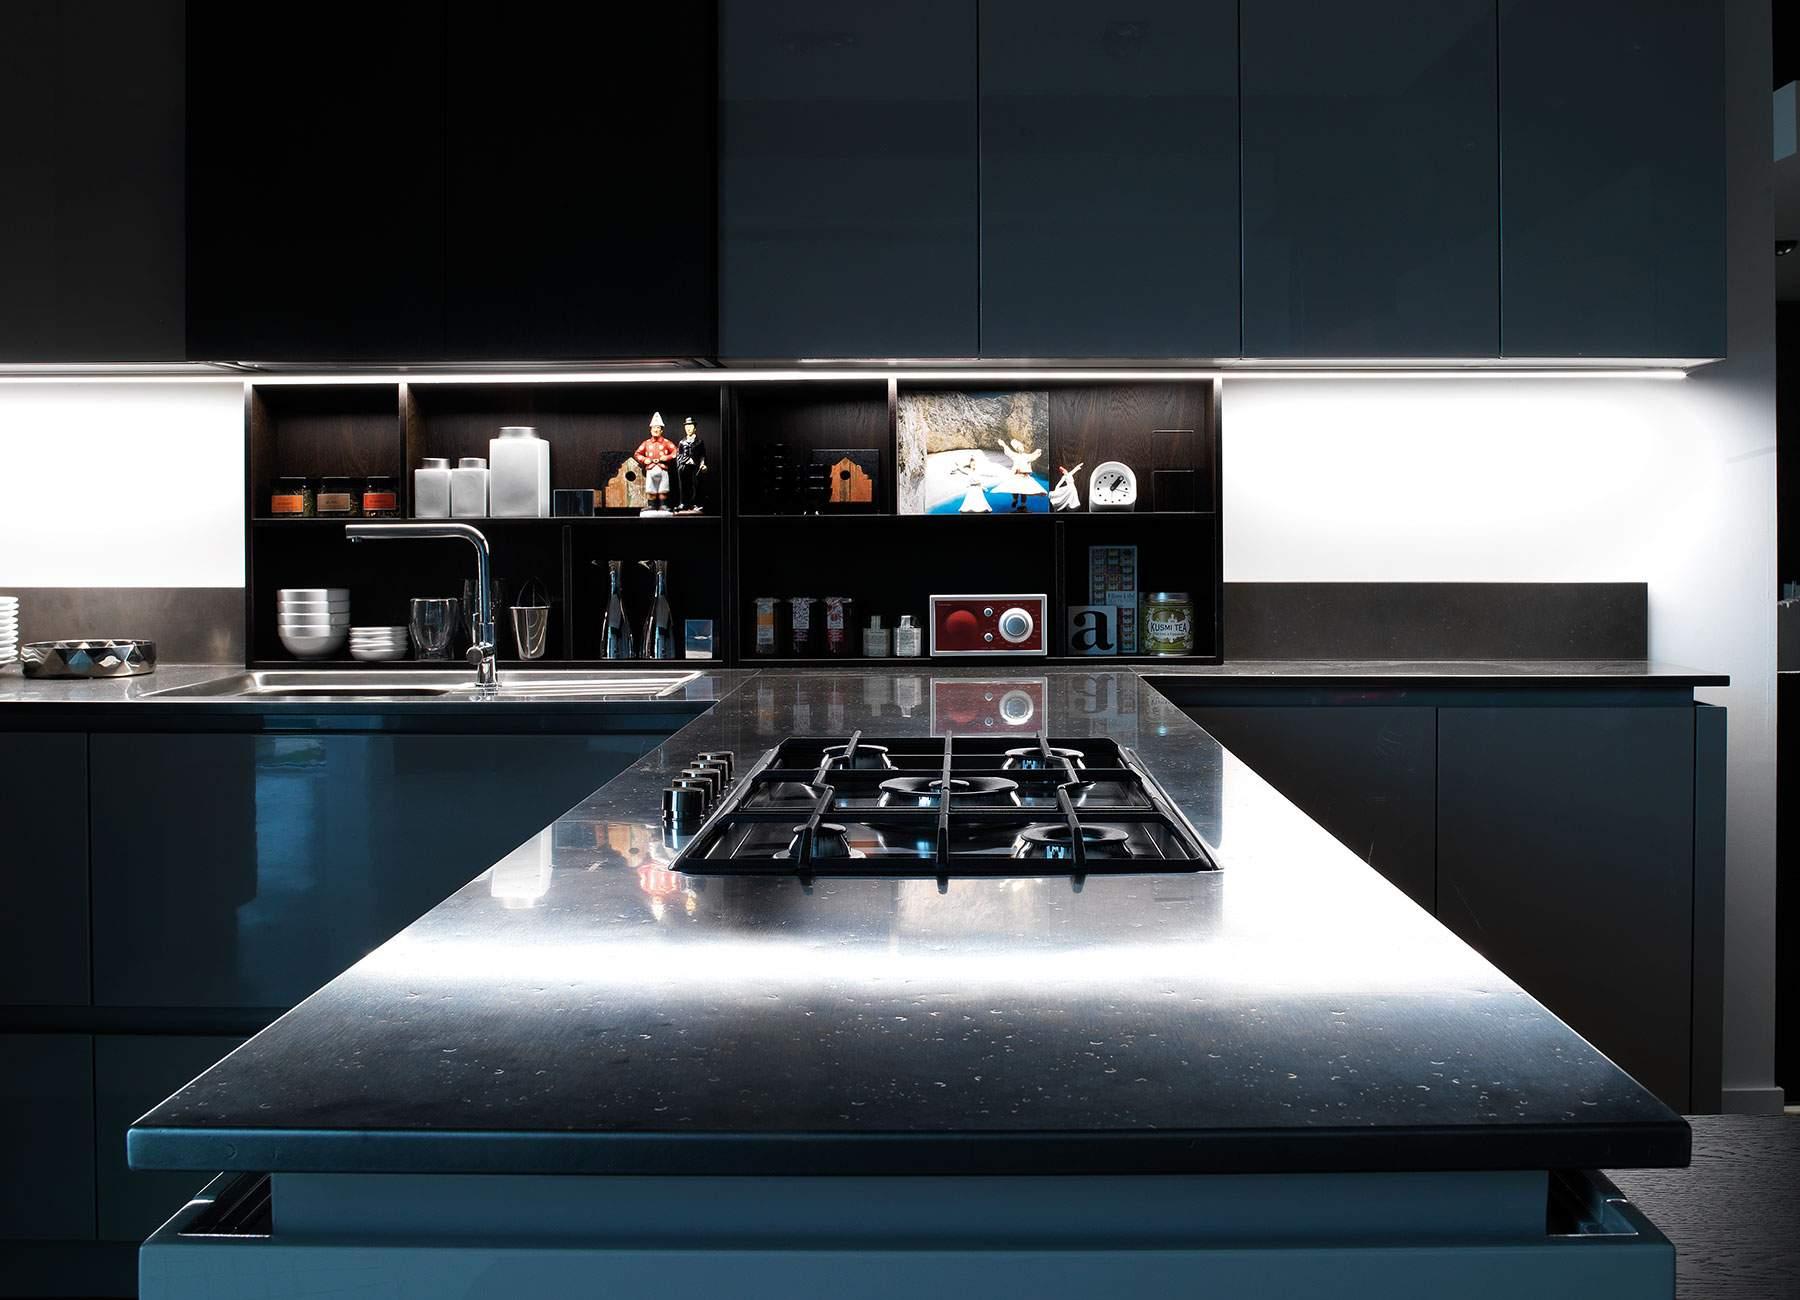 cheap top per cucine al quarzo top al quarzo per cucine top per with mobili da cucina profondit 50 cm